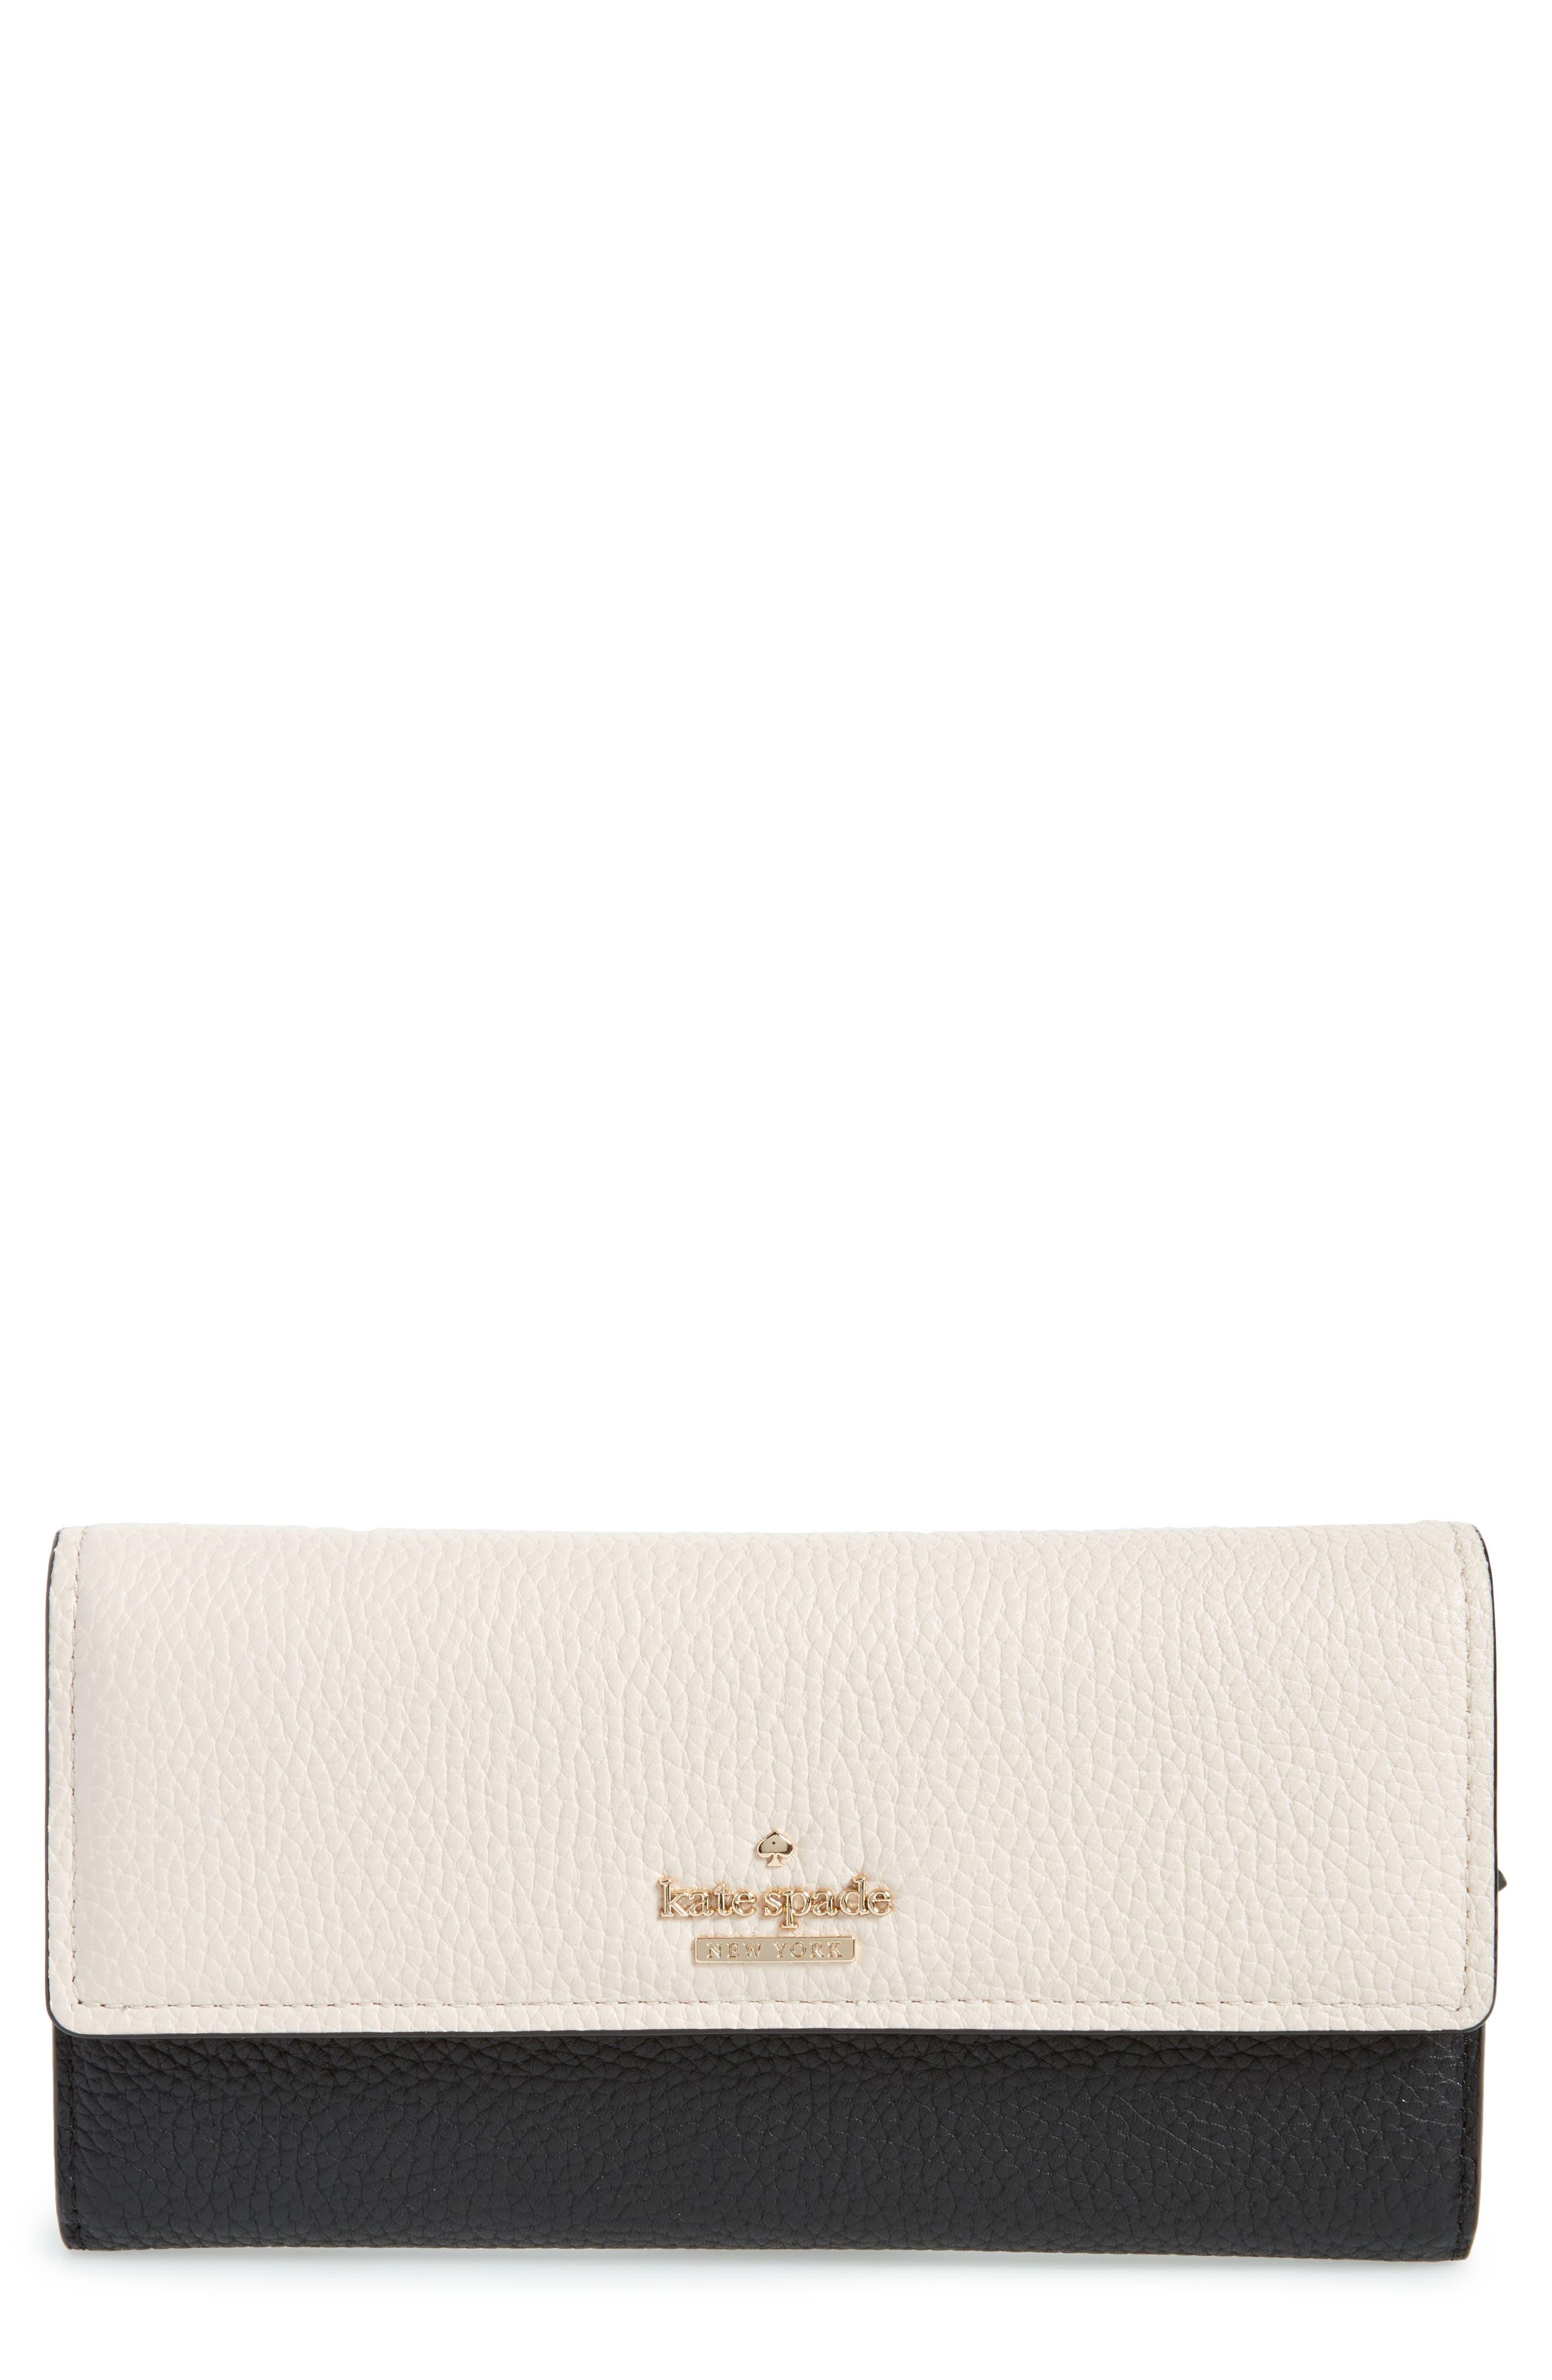 jackson street - kinsley leather wallet,                             Main thumbnail 1, color,                             Black/ Bleach Bone